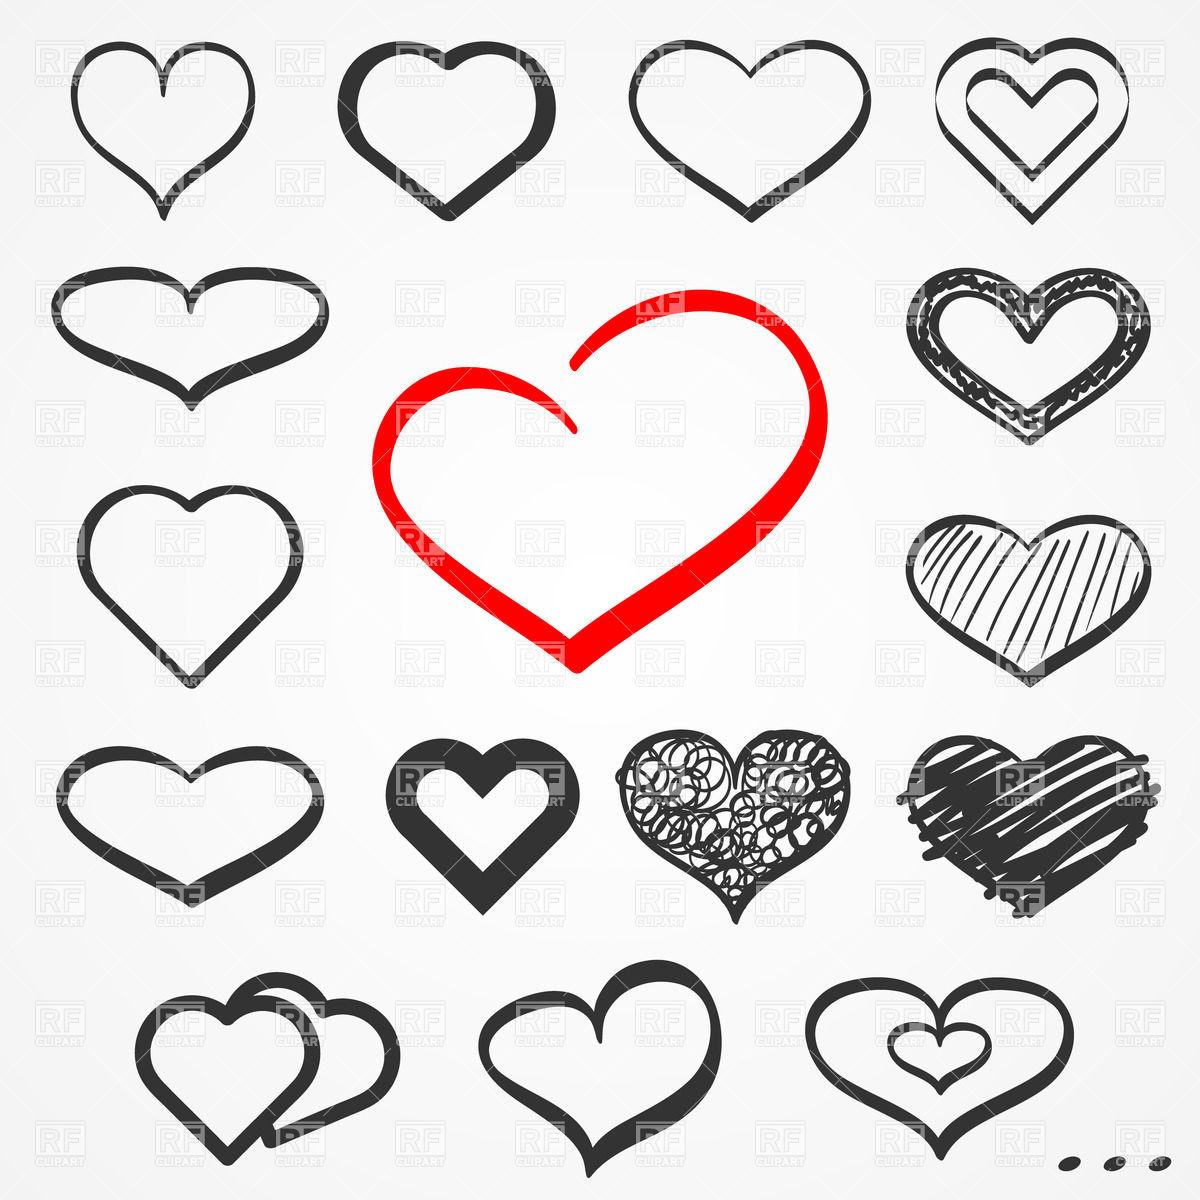 Hearts Free Clipart